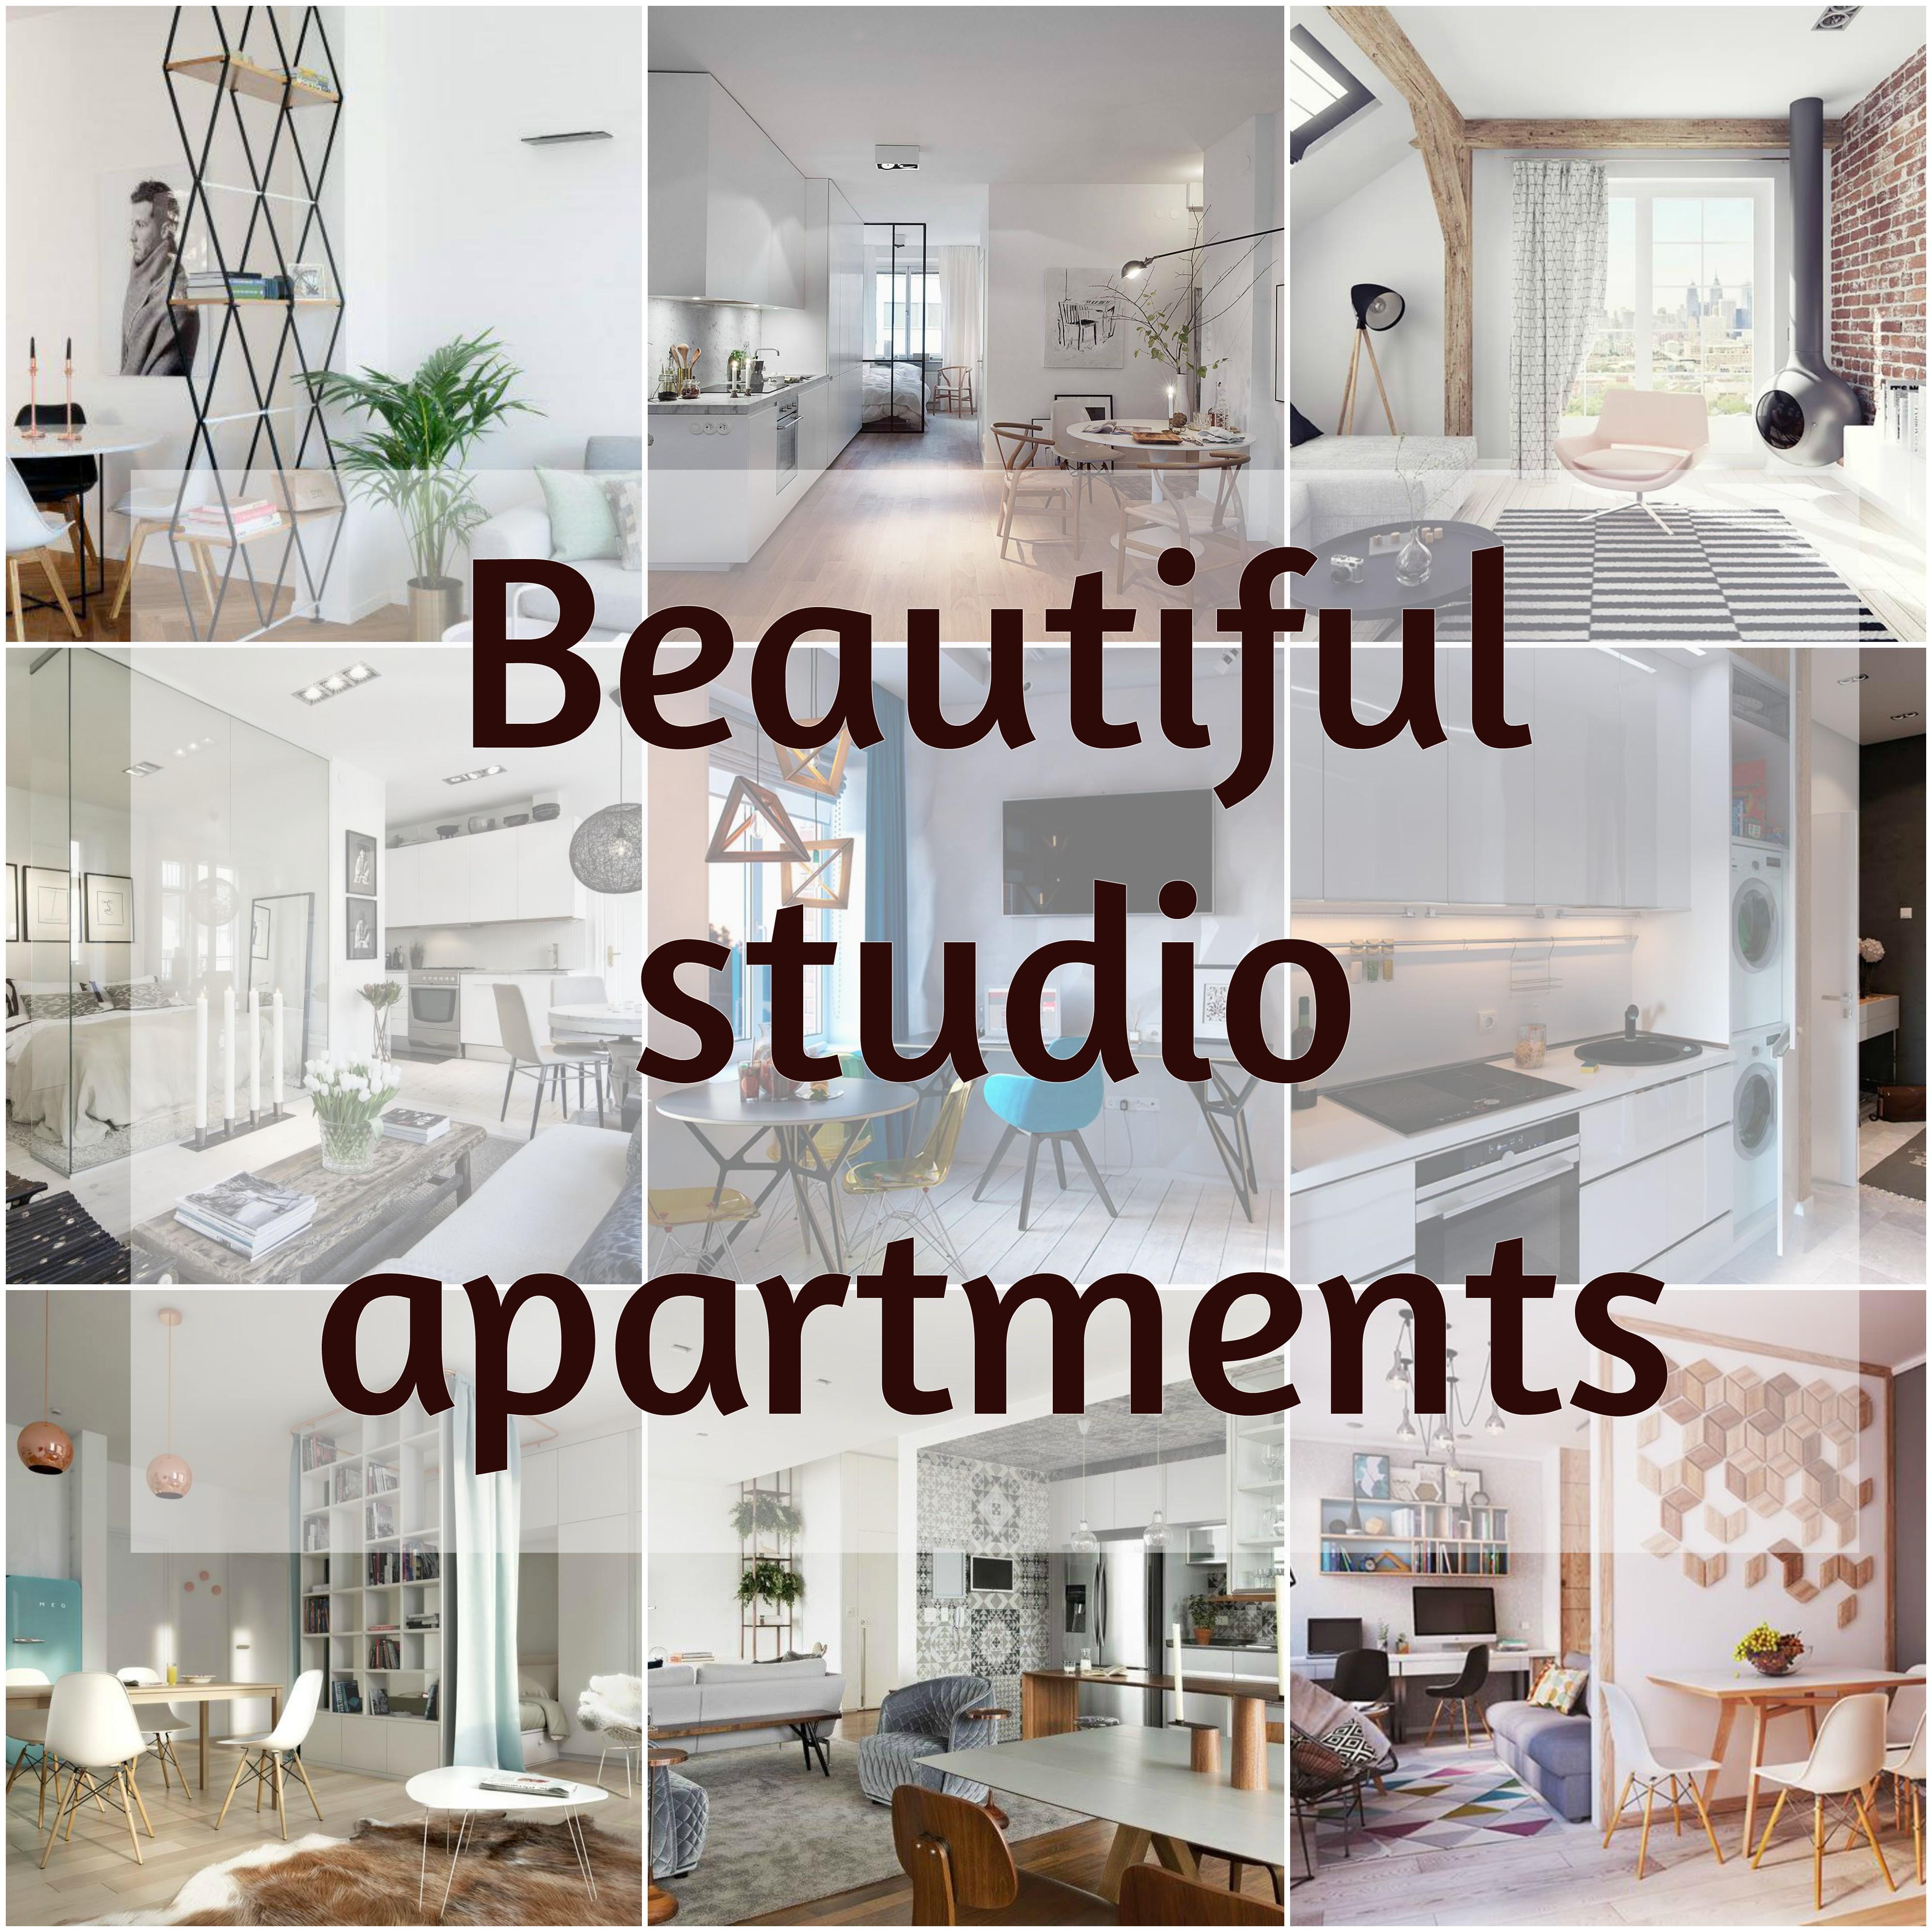 Beautiful studio apartments - allthestufficareabout.com